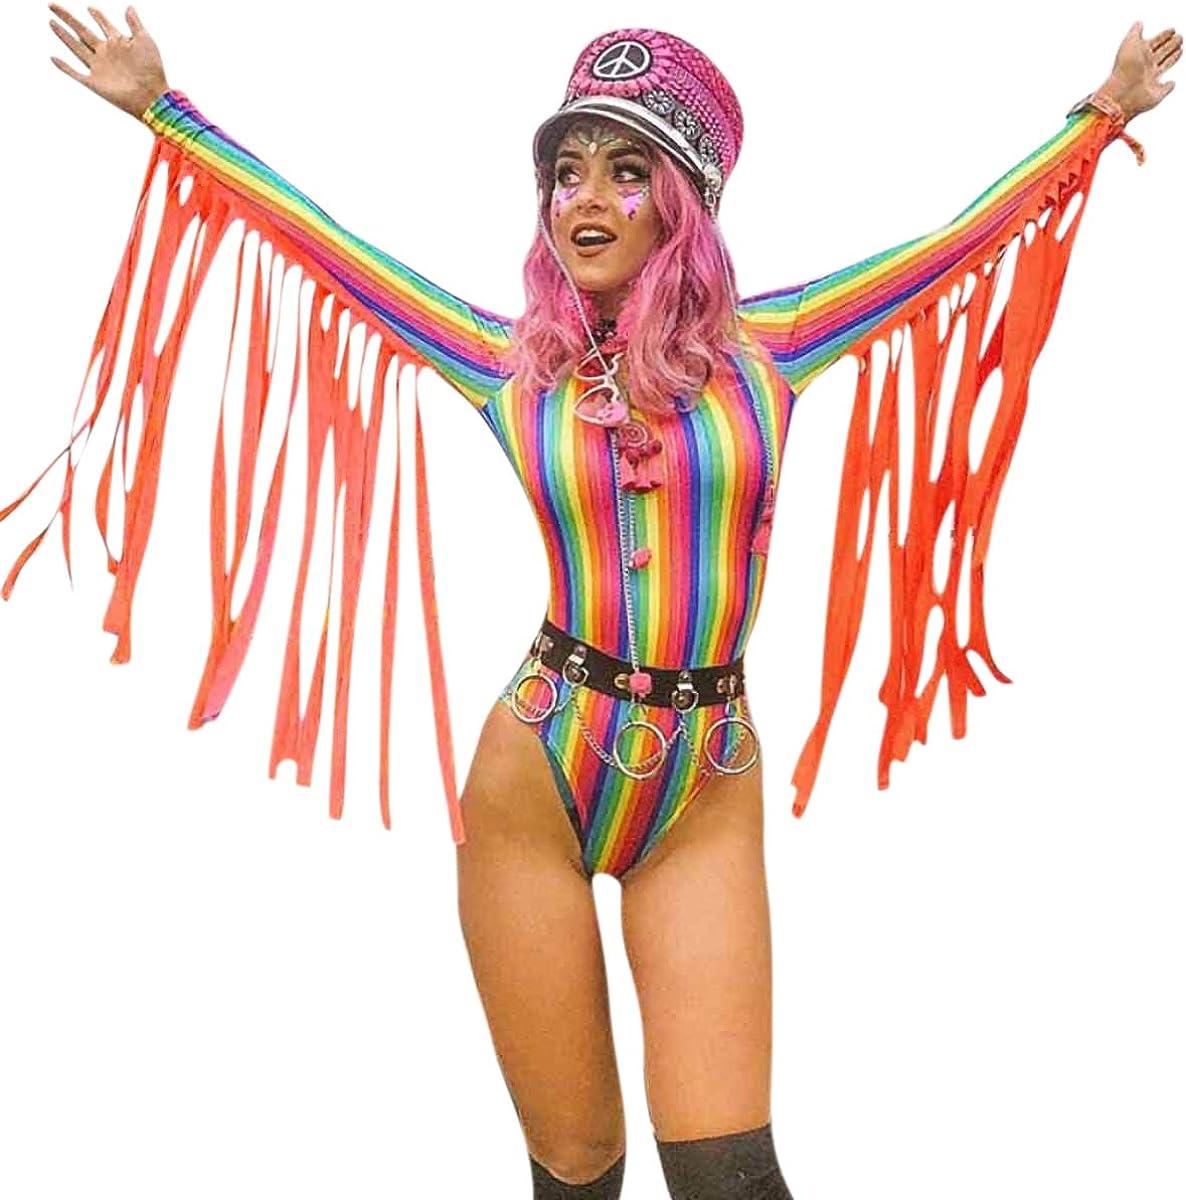 Tie-Dye Braided Festival Rave Bodysuit Women/'s Small